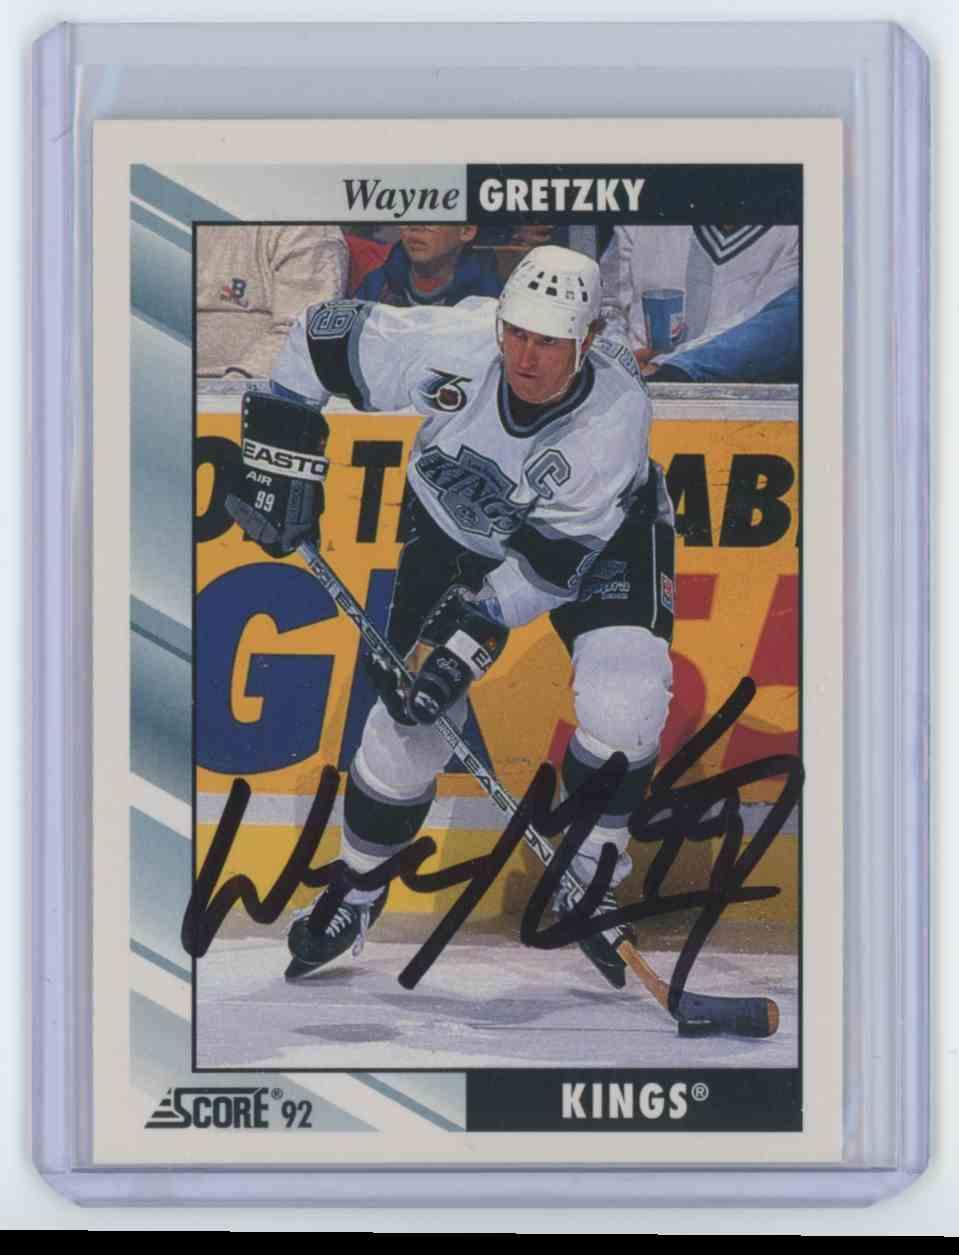 1992 1992-93 Score Wayne Gretzky #1 Los Angeles Kings Auto Wayne Gretzky #1 card front image